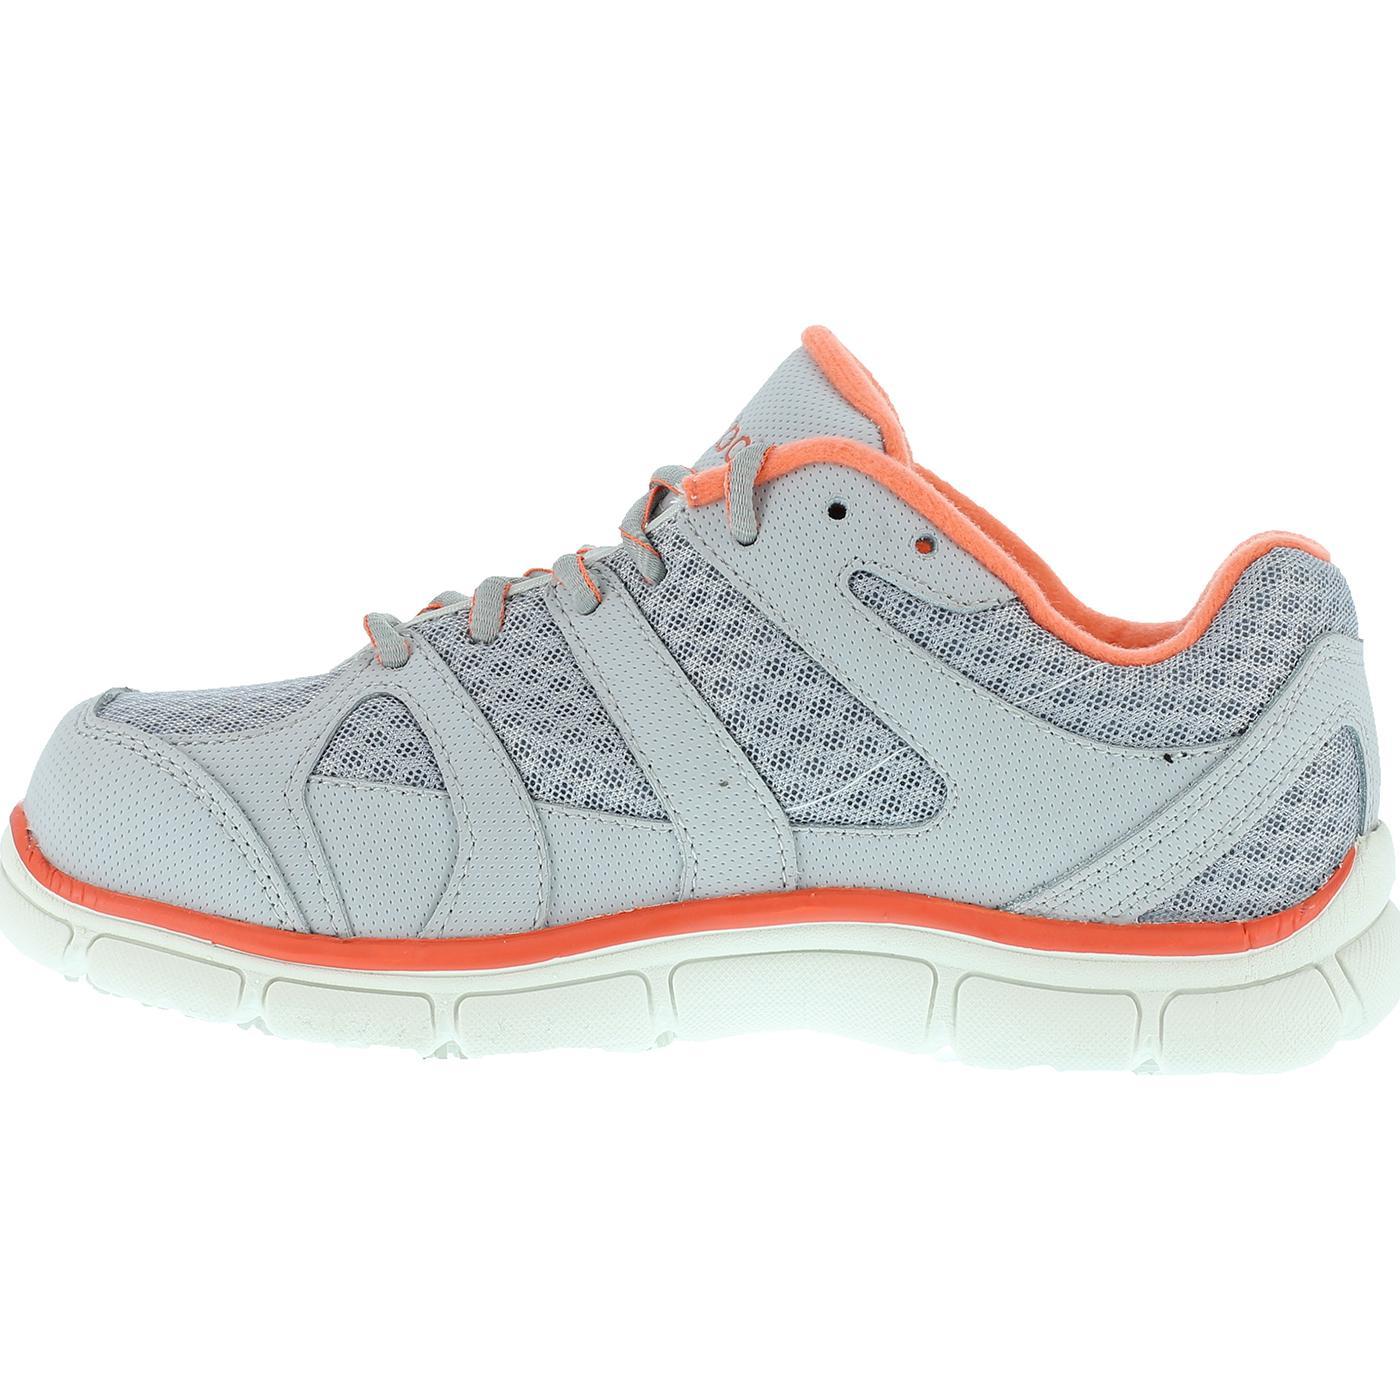 s composite toe slip resistant sneaker by reebok rb229